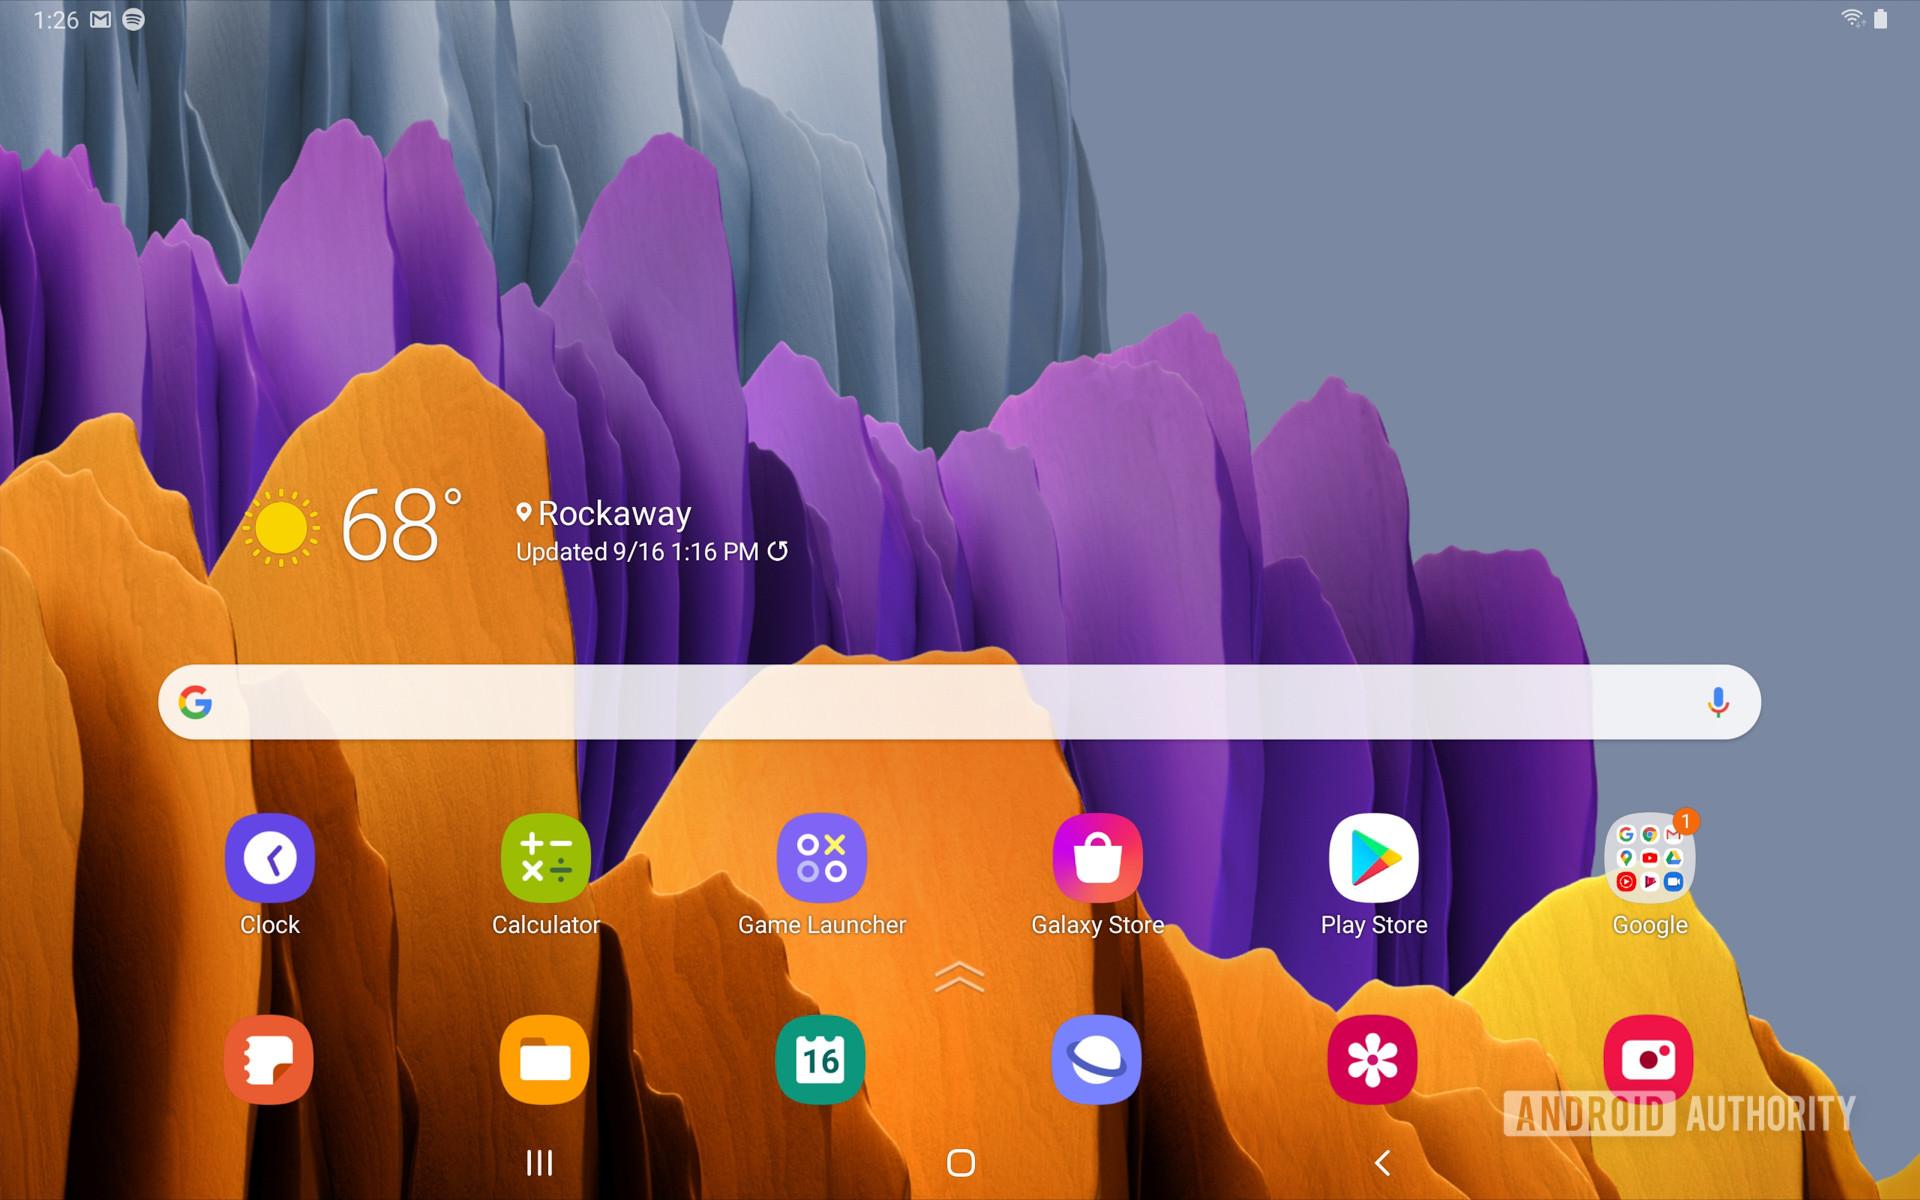 Samsung Galaxy Tab S7 home screen